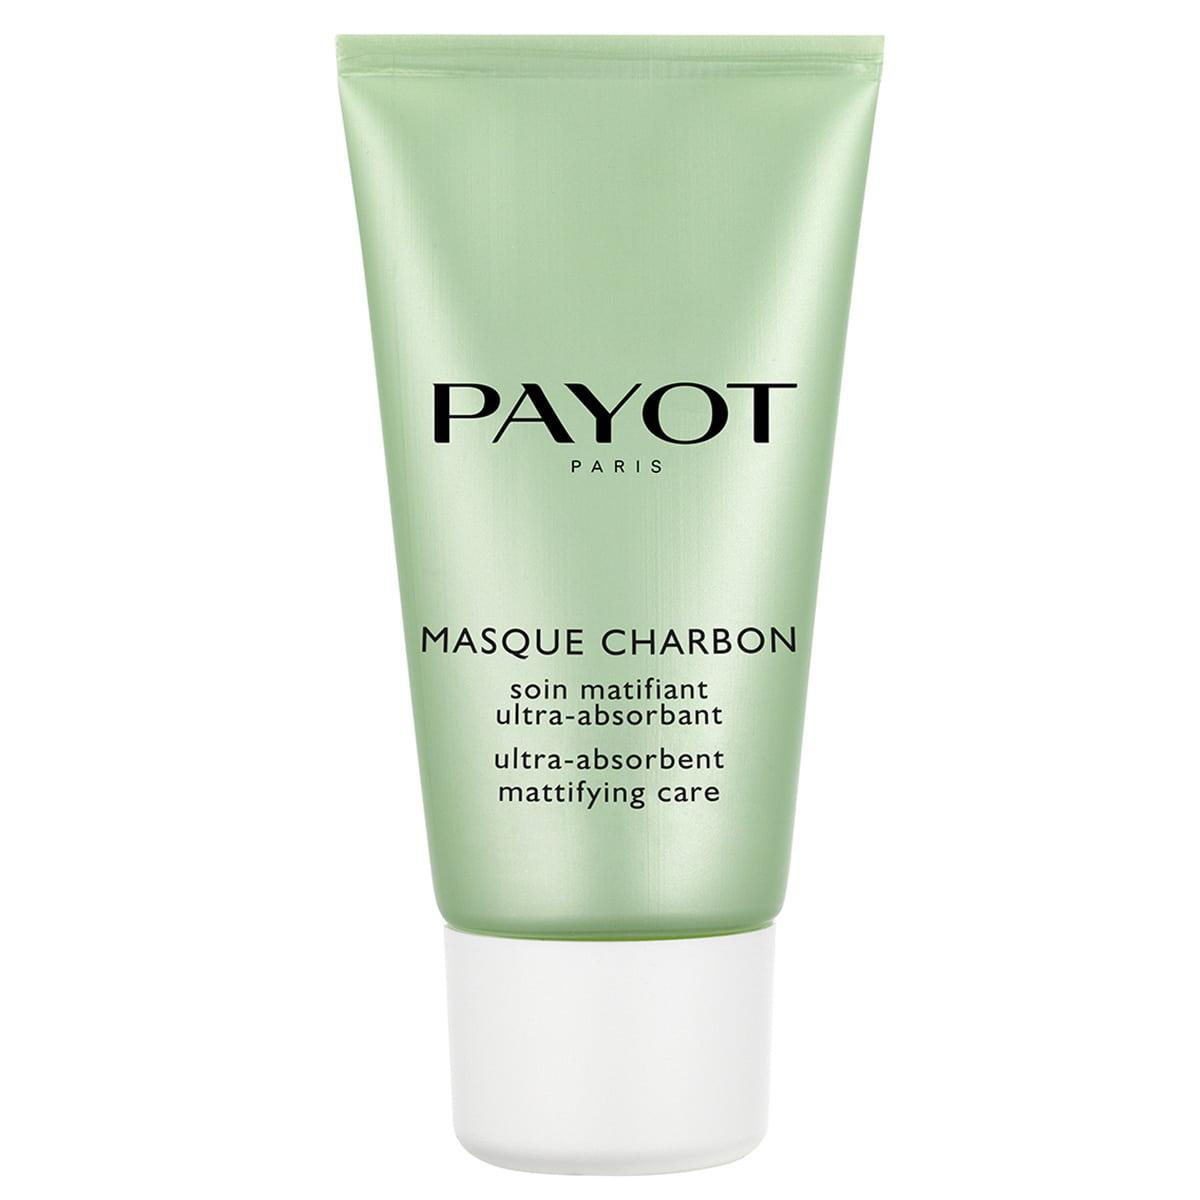 Payot - Pâte Grise Masque Charbon Purifiant - Matifiant ultra-absorbant